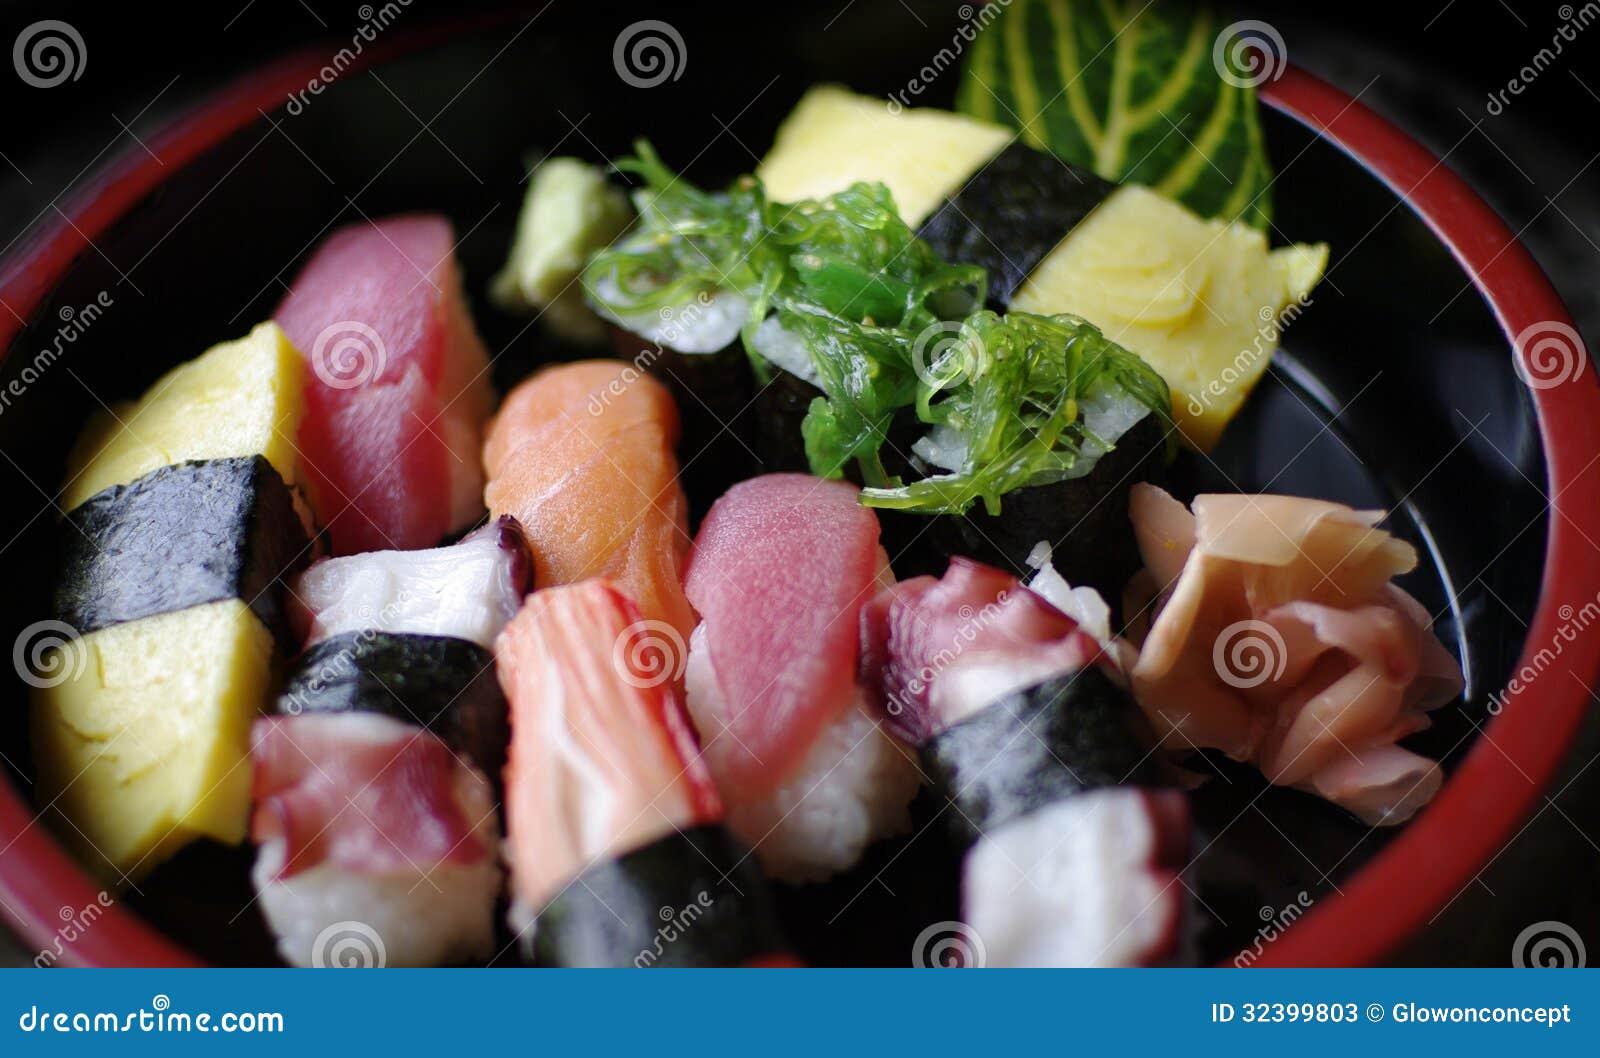 sushi beautiful fish food - photo #10